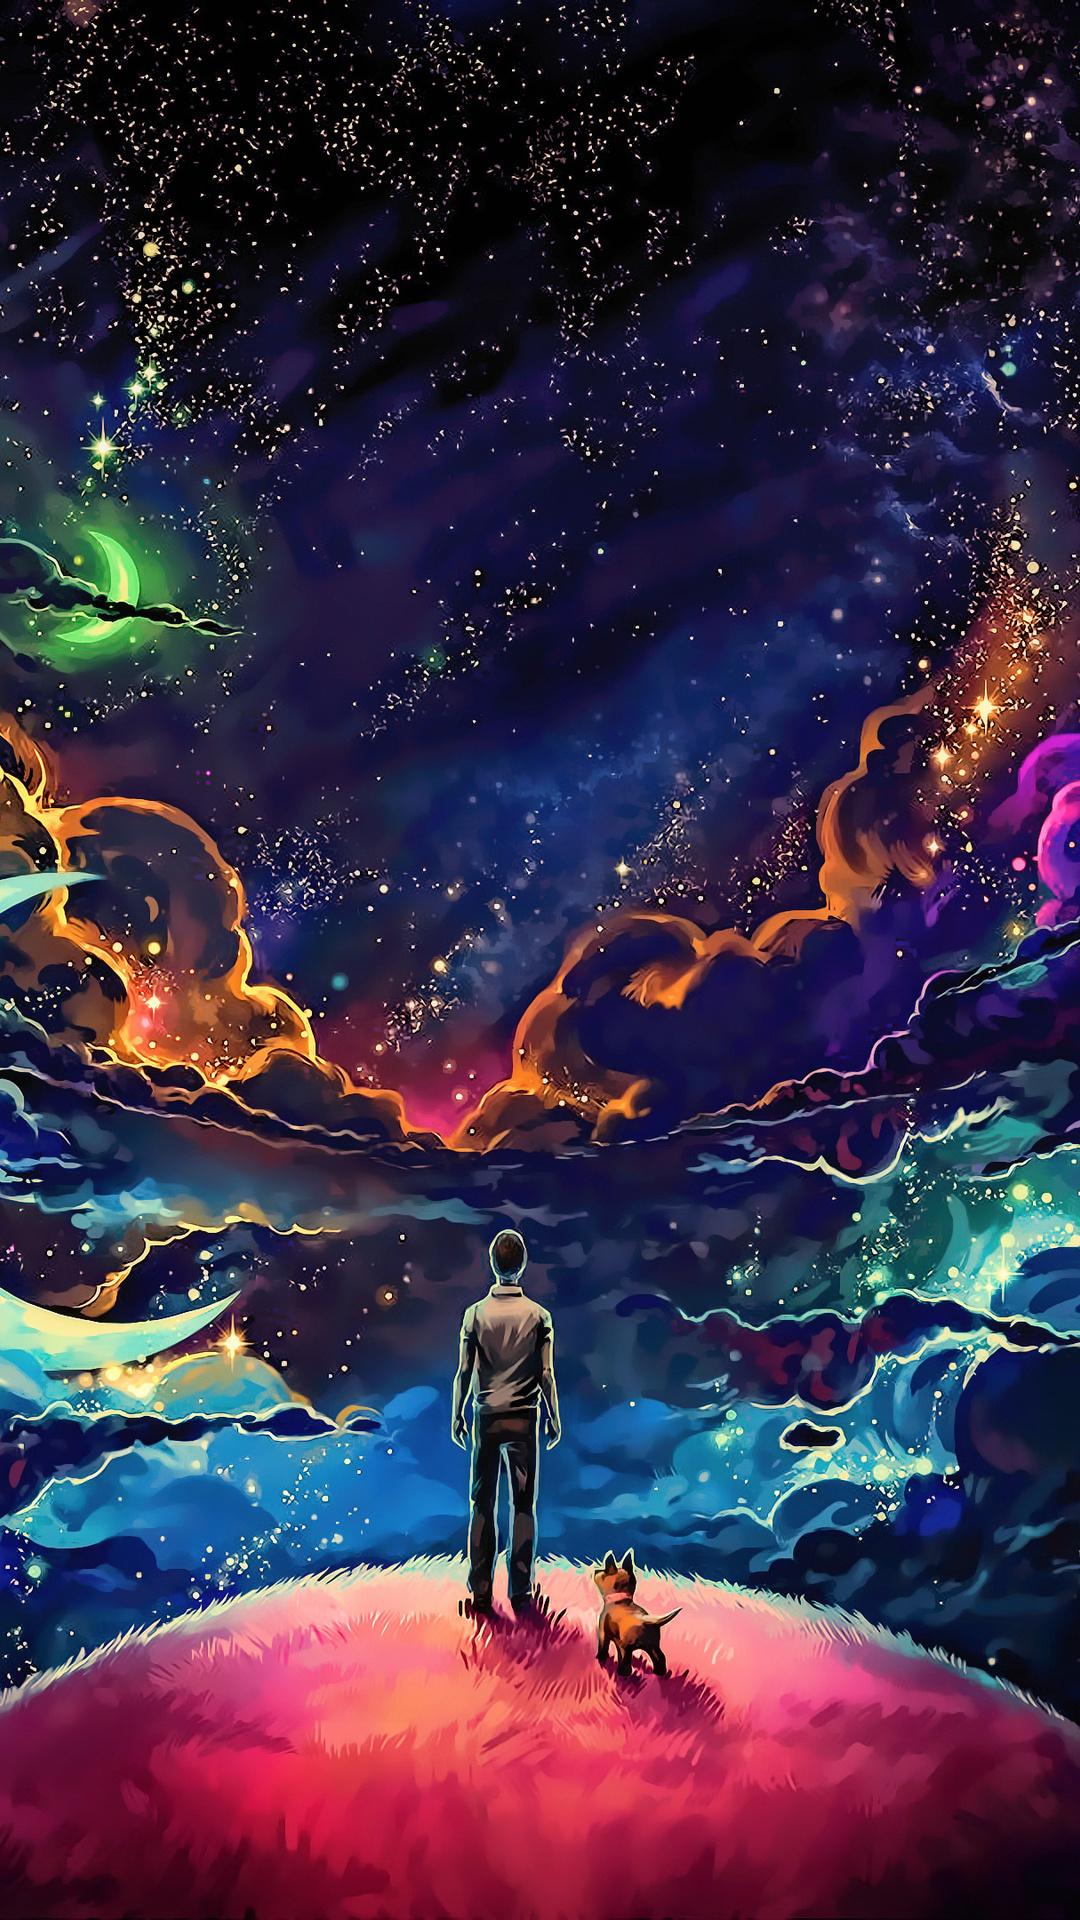 little-prince-with-dog-colorful-science-fiction-fantasy-art-stars-artwork-4k-k7.jpg